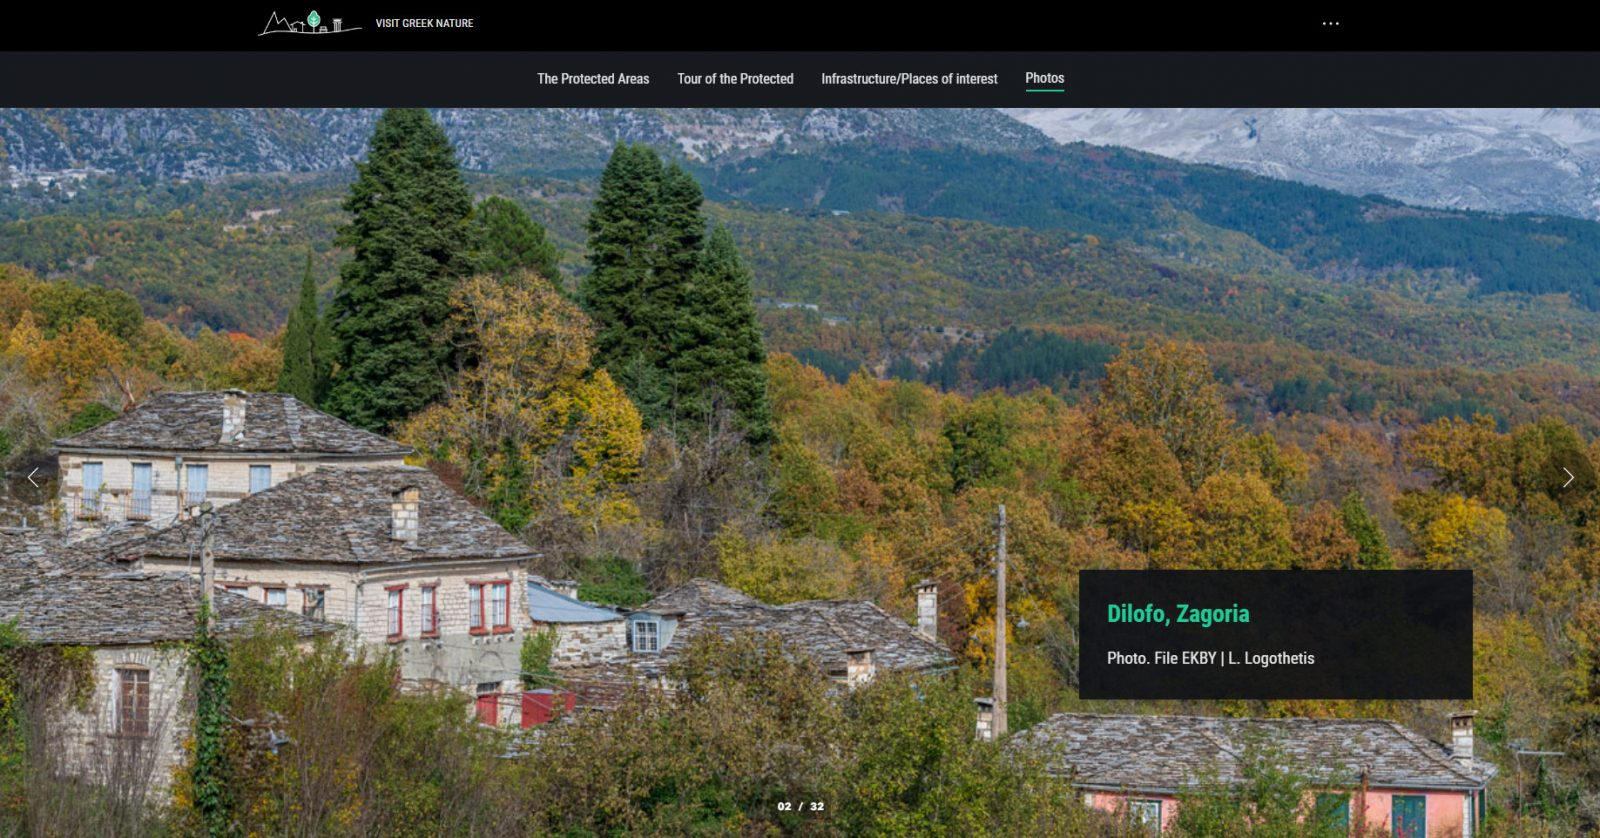 Visit Greek Nature imagery